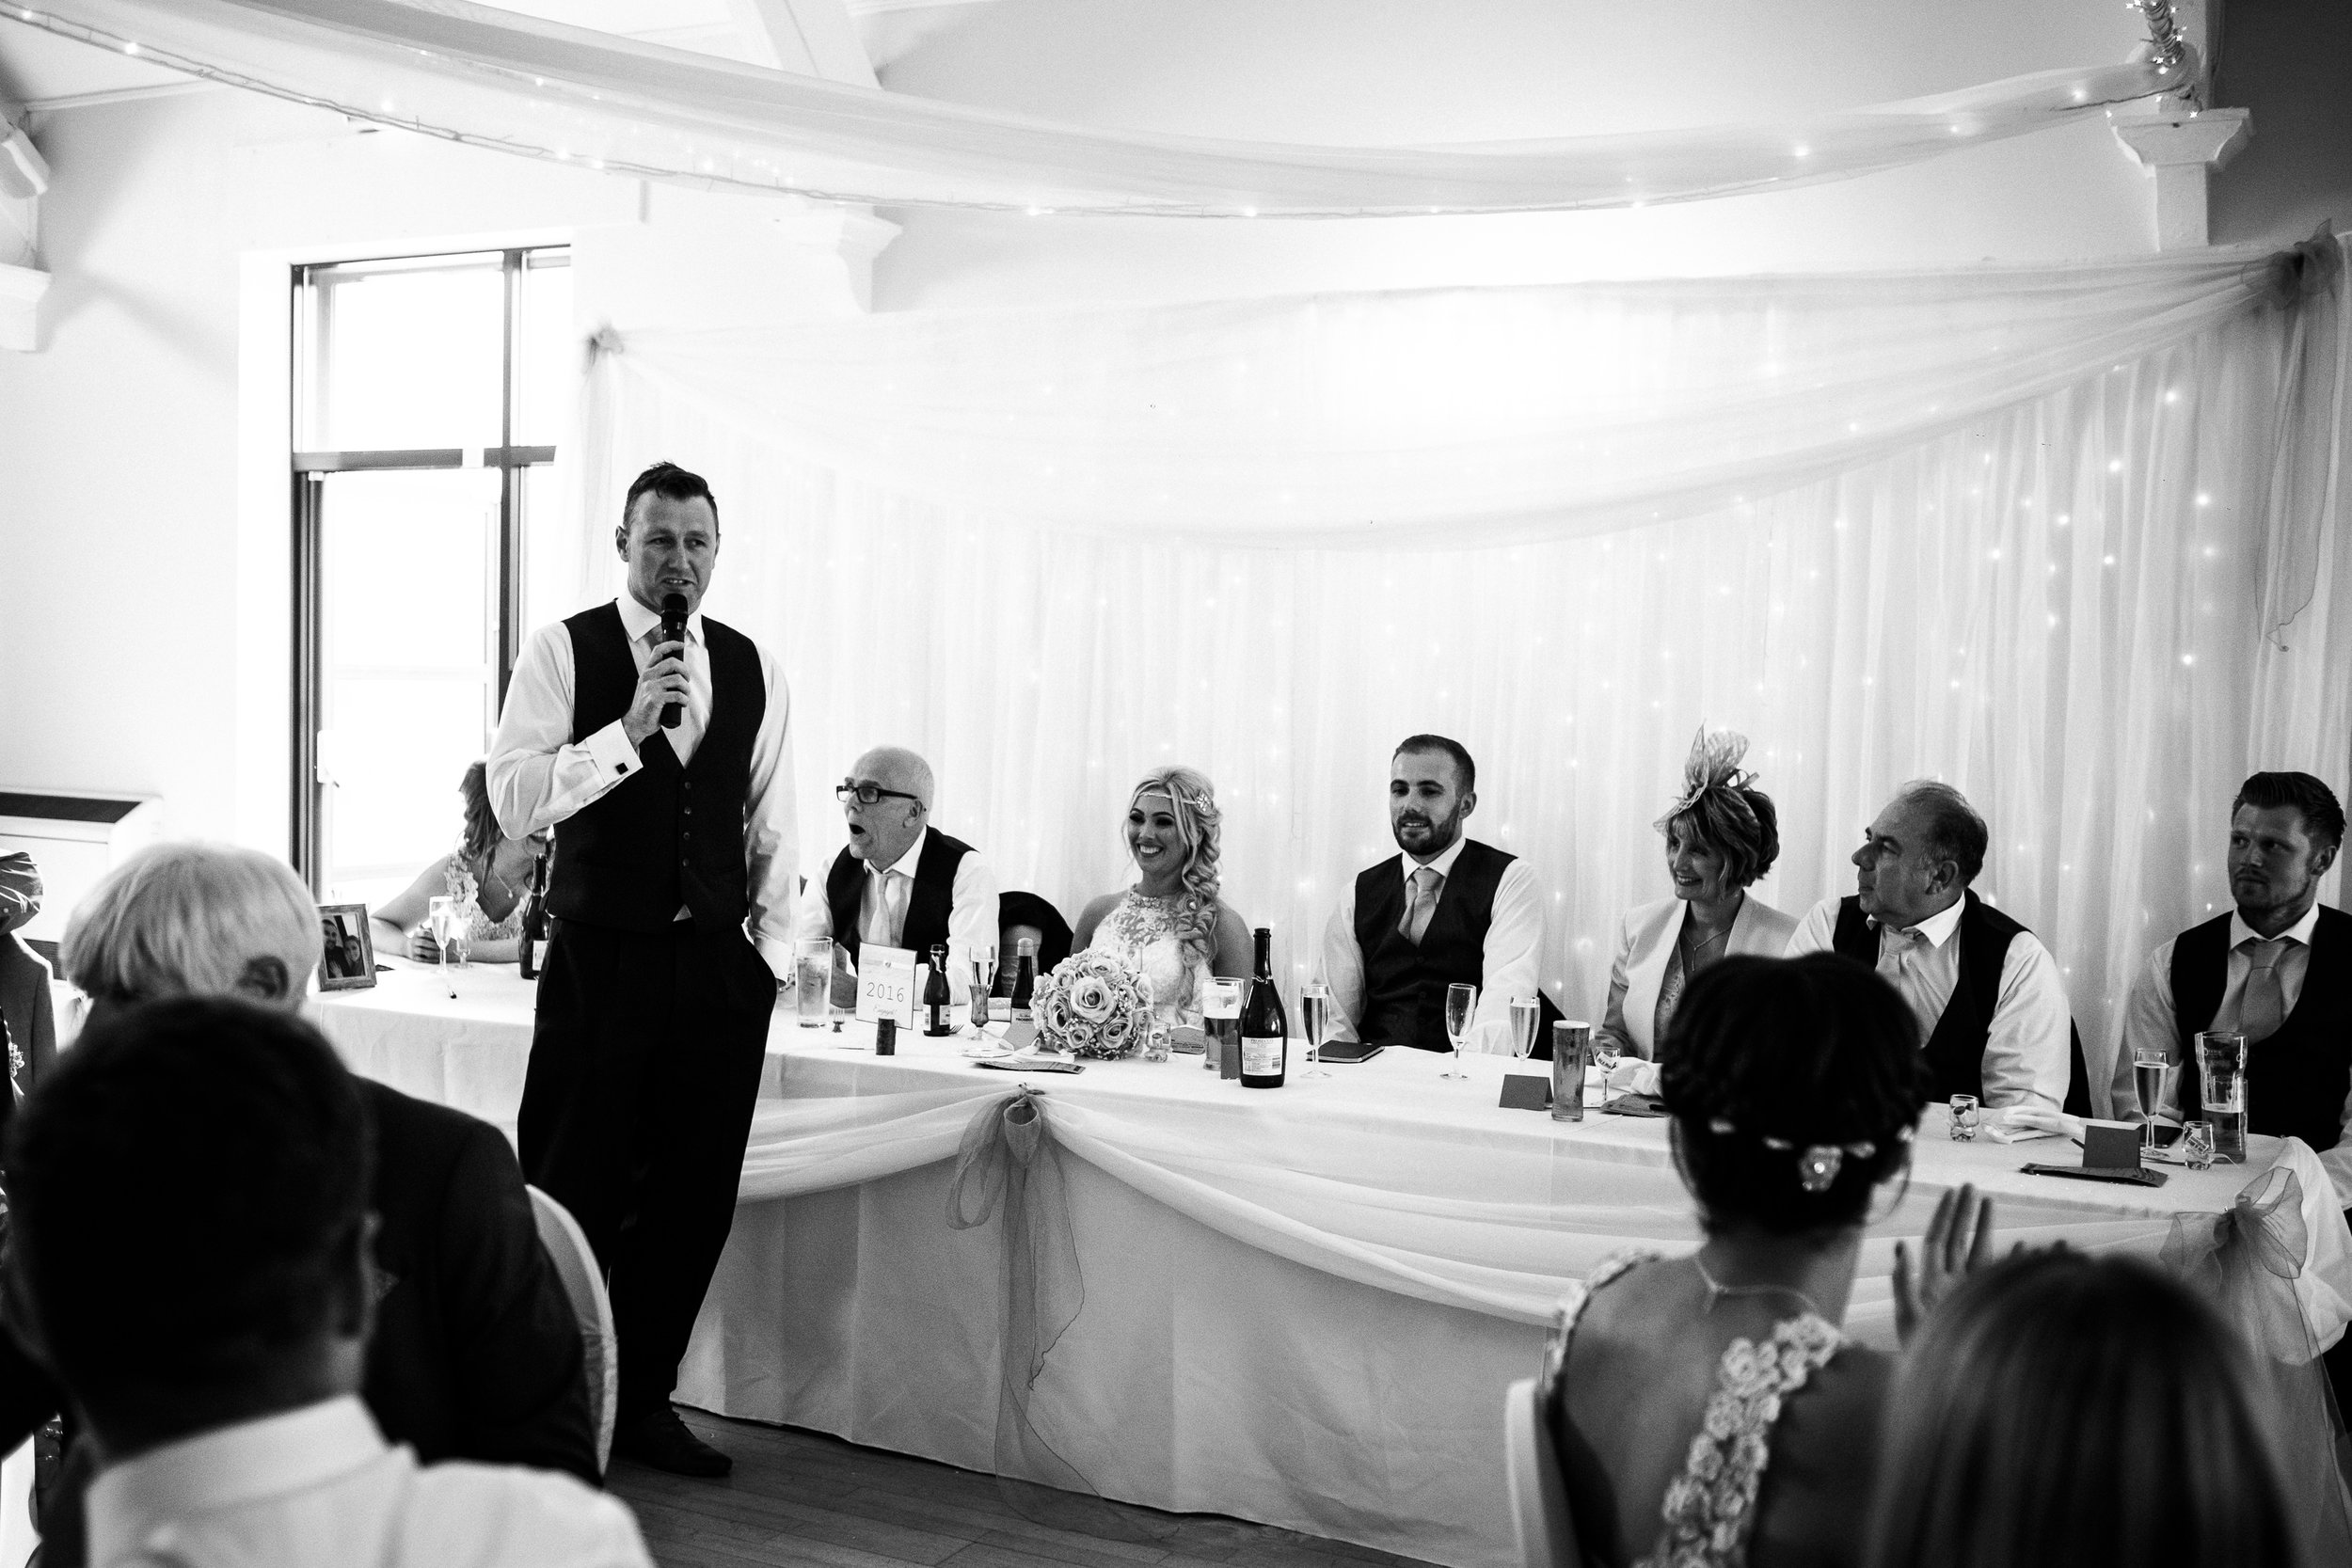 Summer Documentary Wedding Photography Floral Hall, Stoke-on-Trent, Staffordshire - Jenny Harper-41.jpg